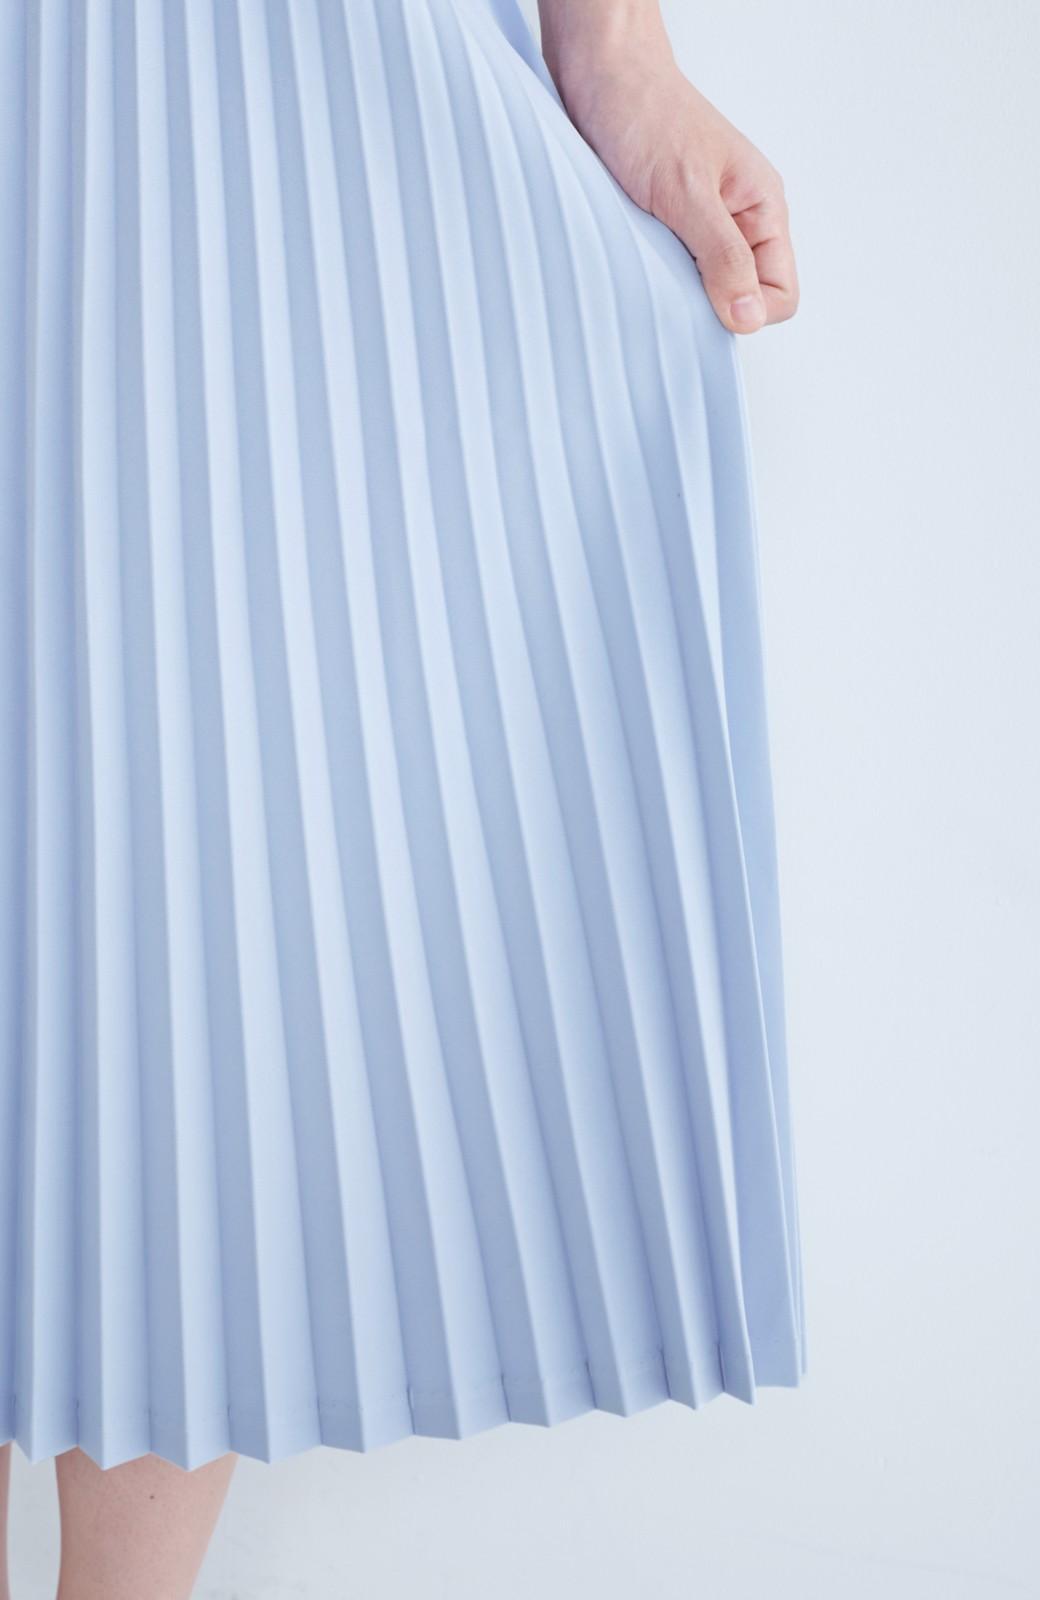 haco! 【mer11月号掲載】折り目正しい大人のためのプリーツスカート by que made me <サックスブルー>の商品写真9